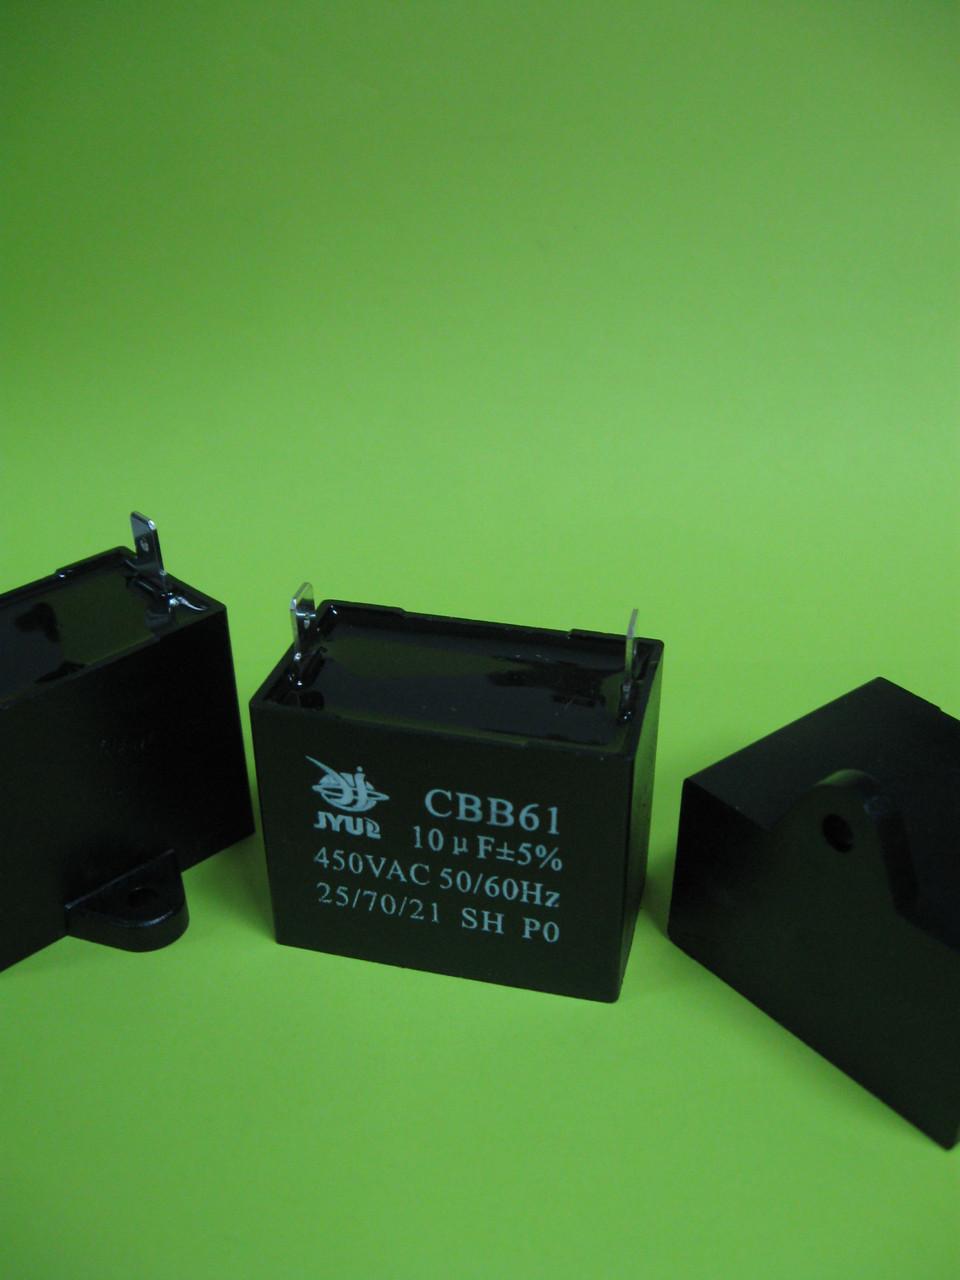 Конденсатор CBB-61 10uF 450VAC на клеммах 6,3мм JYUL